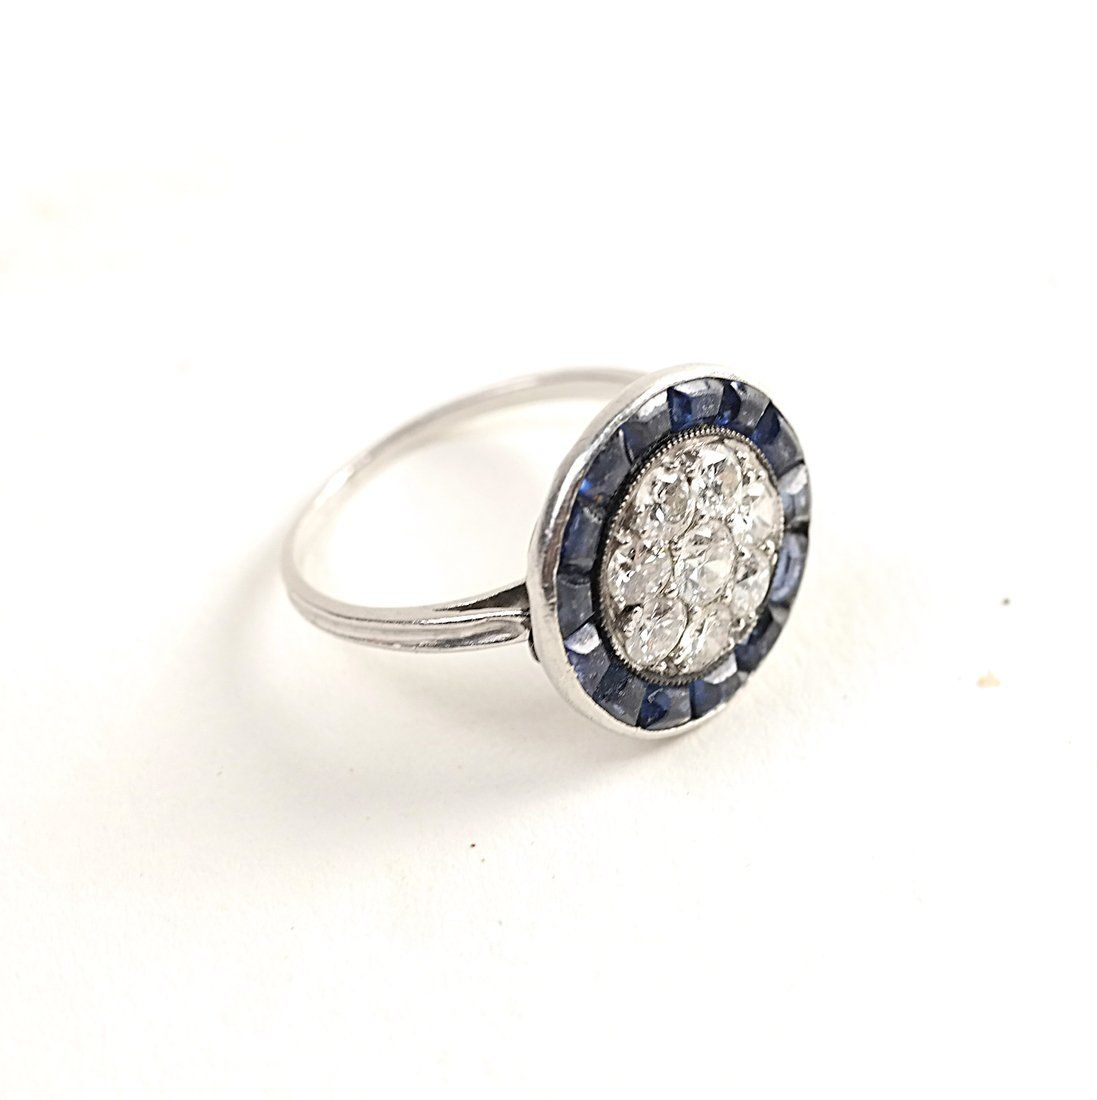 Platinum and Diamond Cocktail Ring